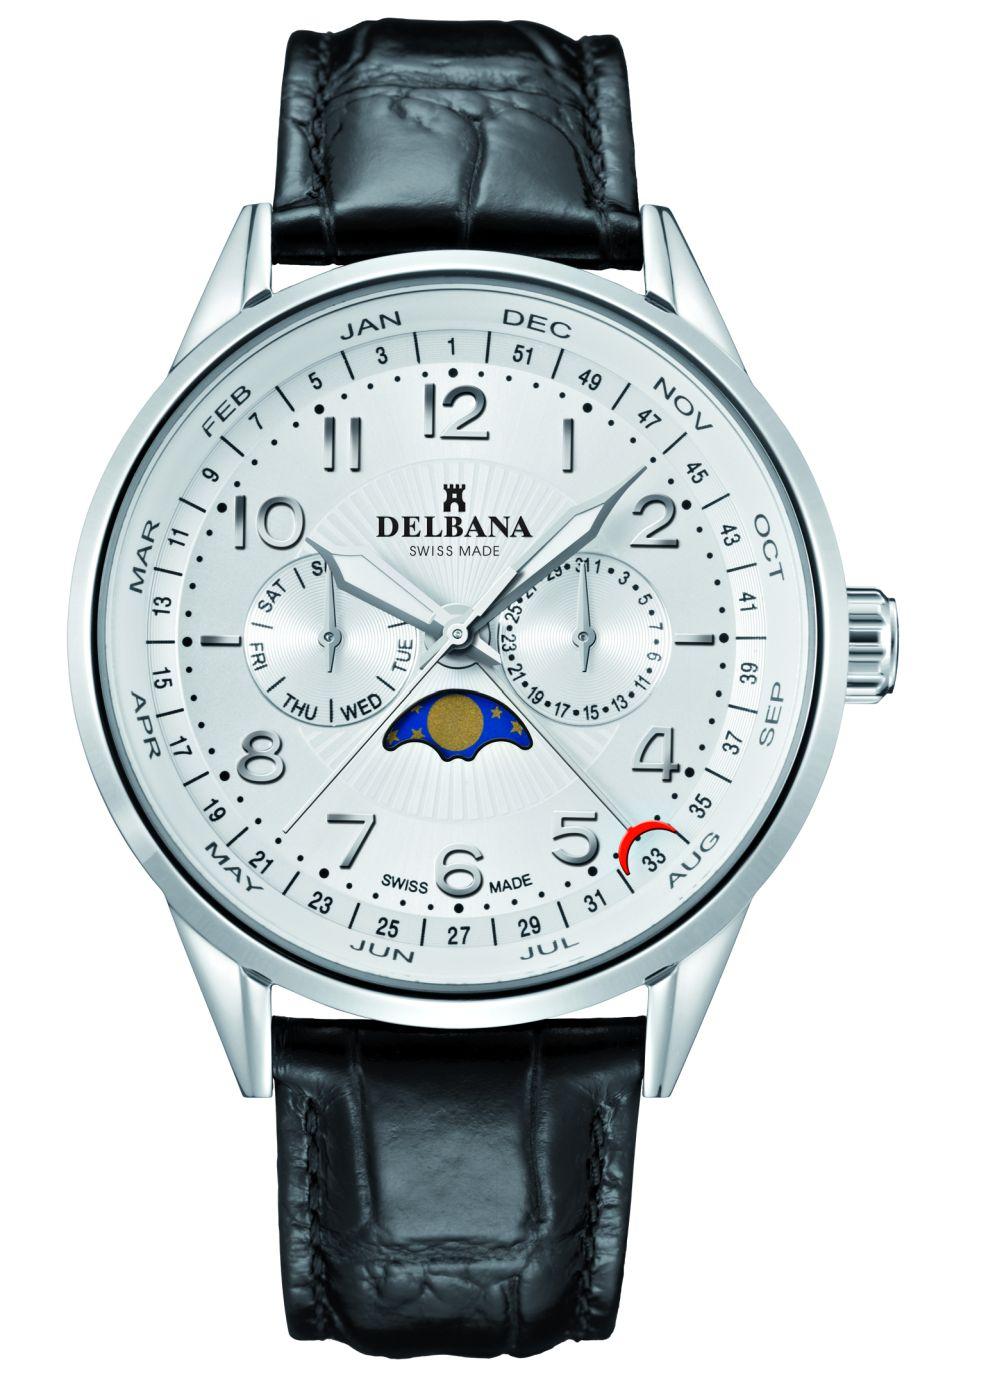 DELBANA Retro Mondphase, leather, dial white - Swiss made